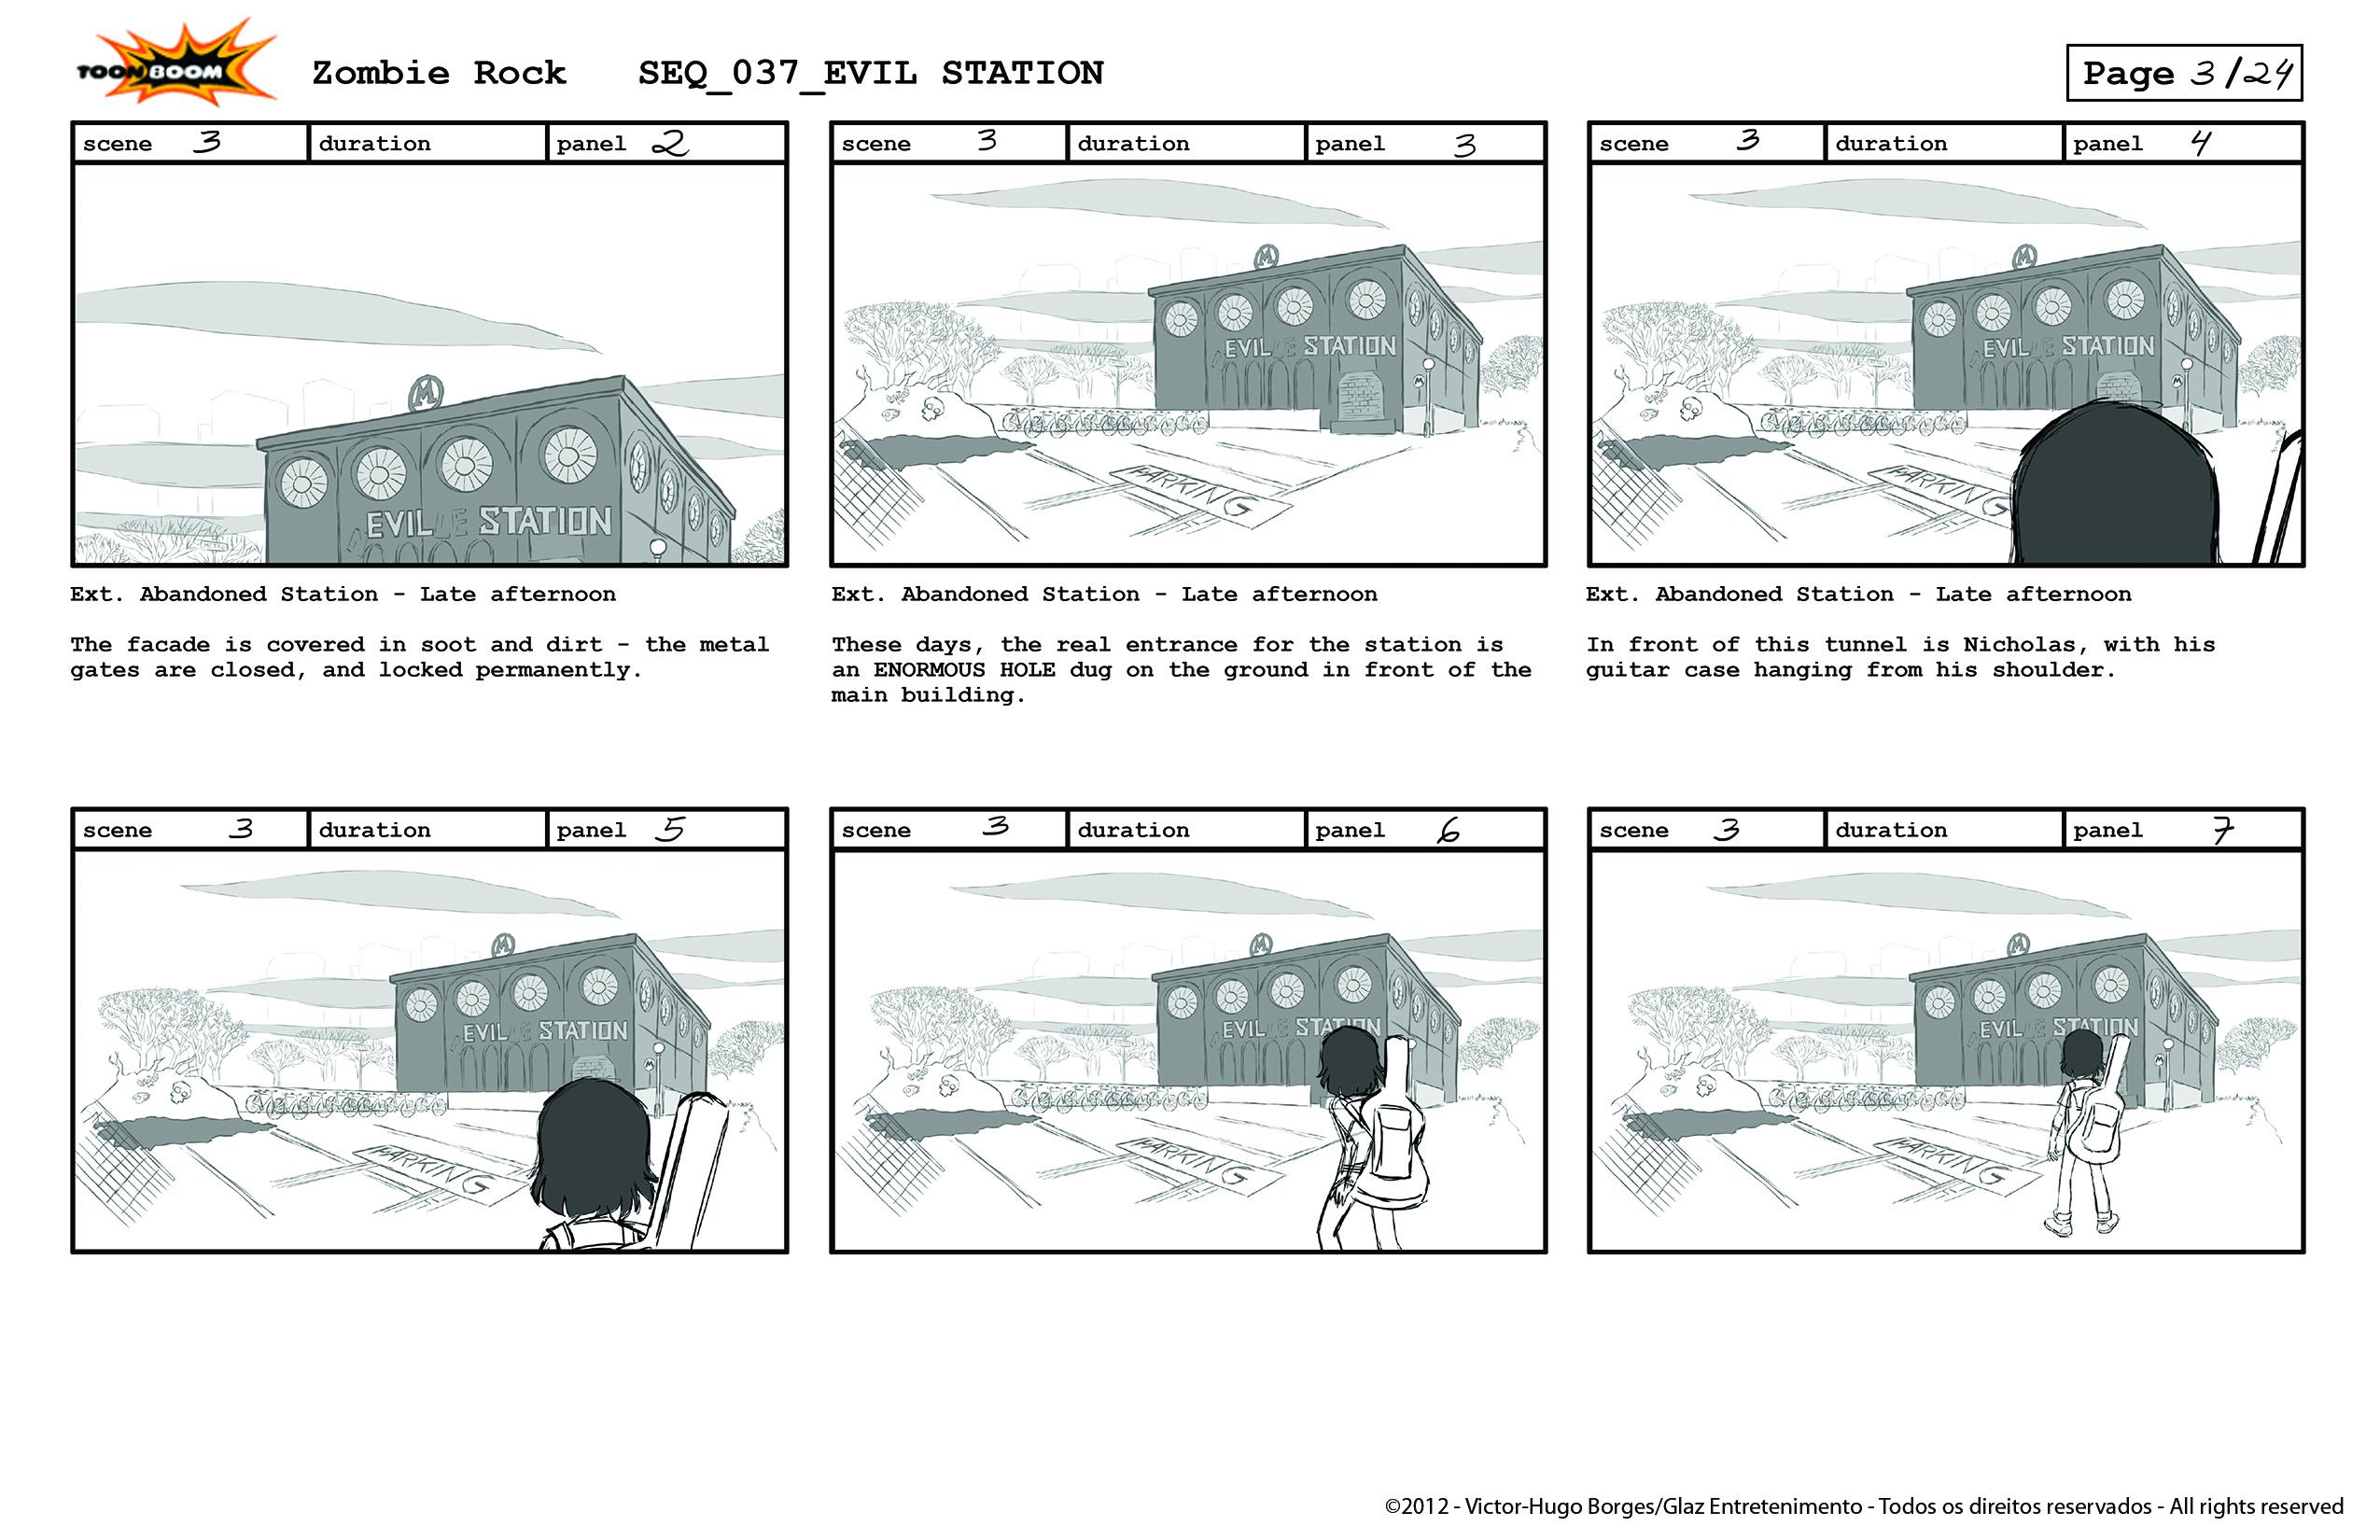 SEQ037_Evil Station_page03